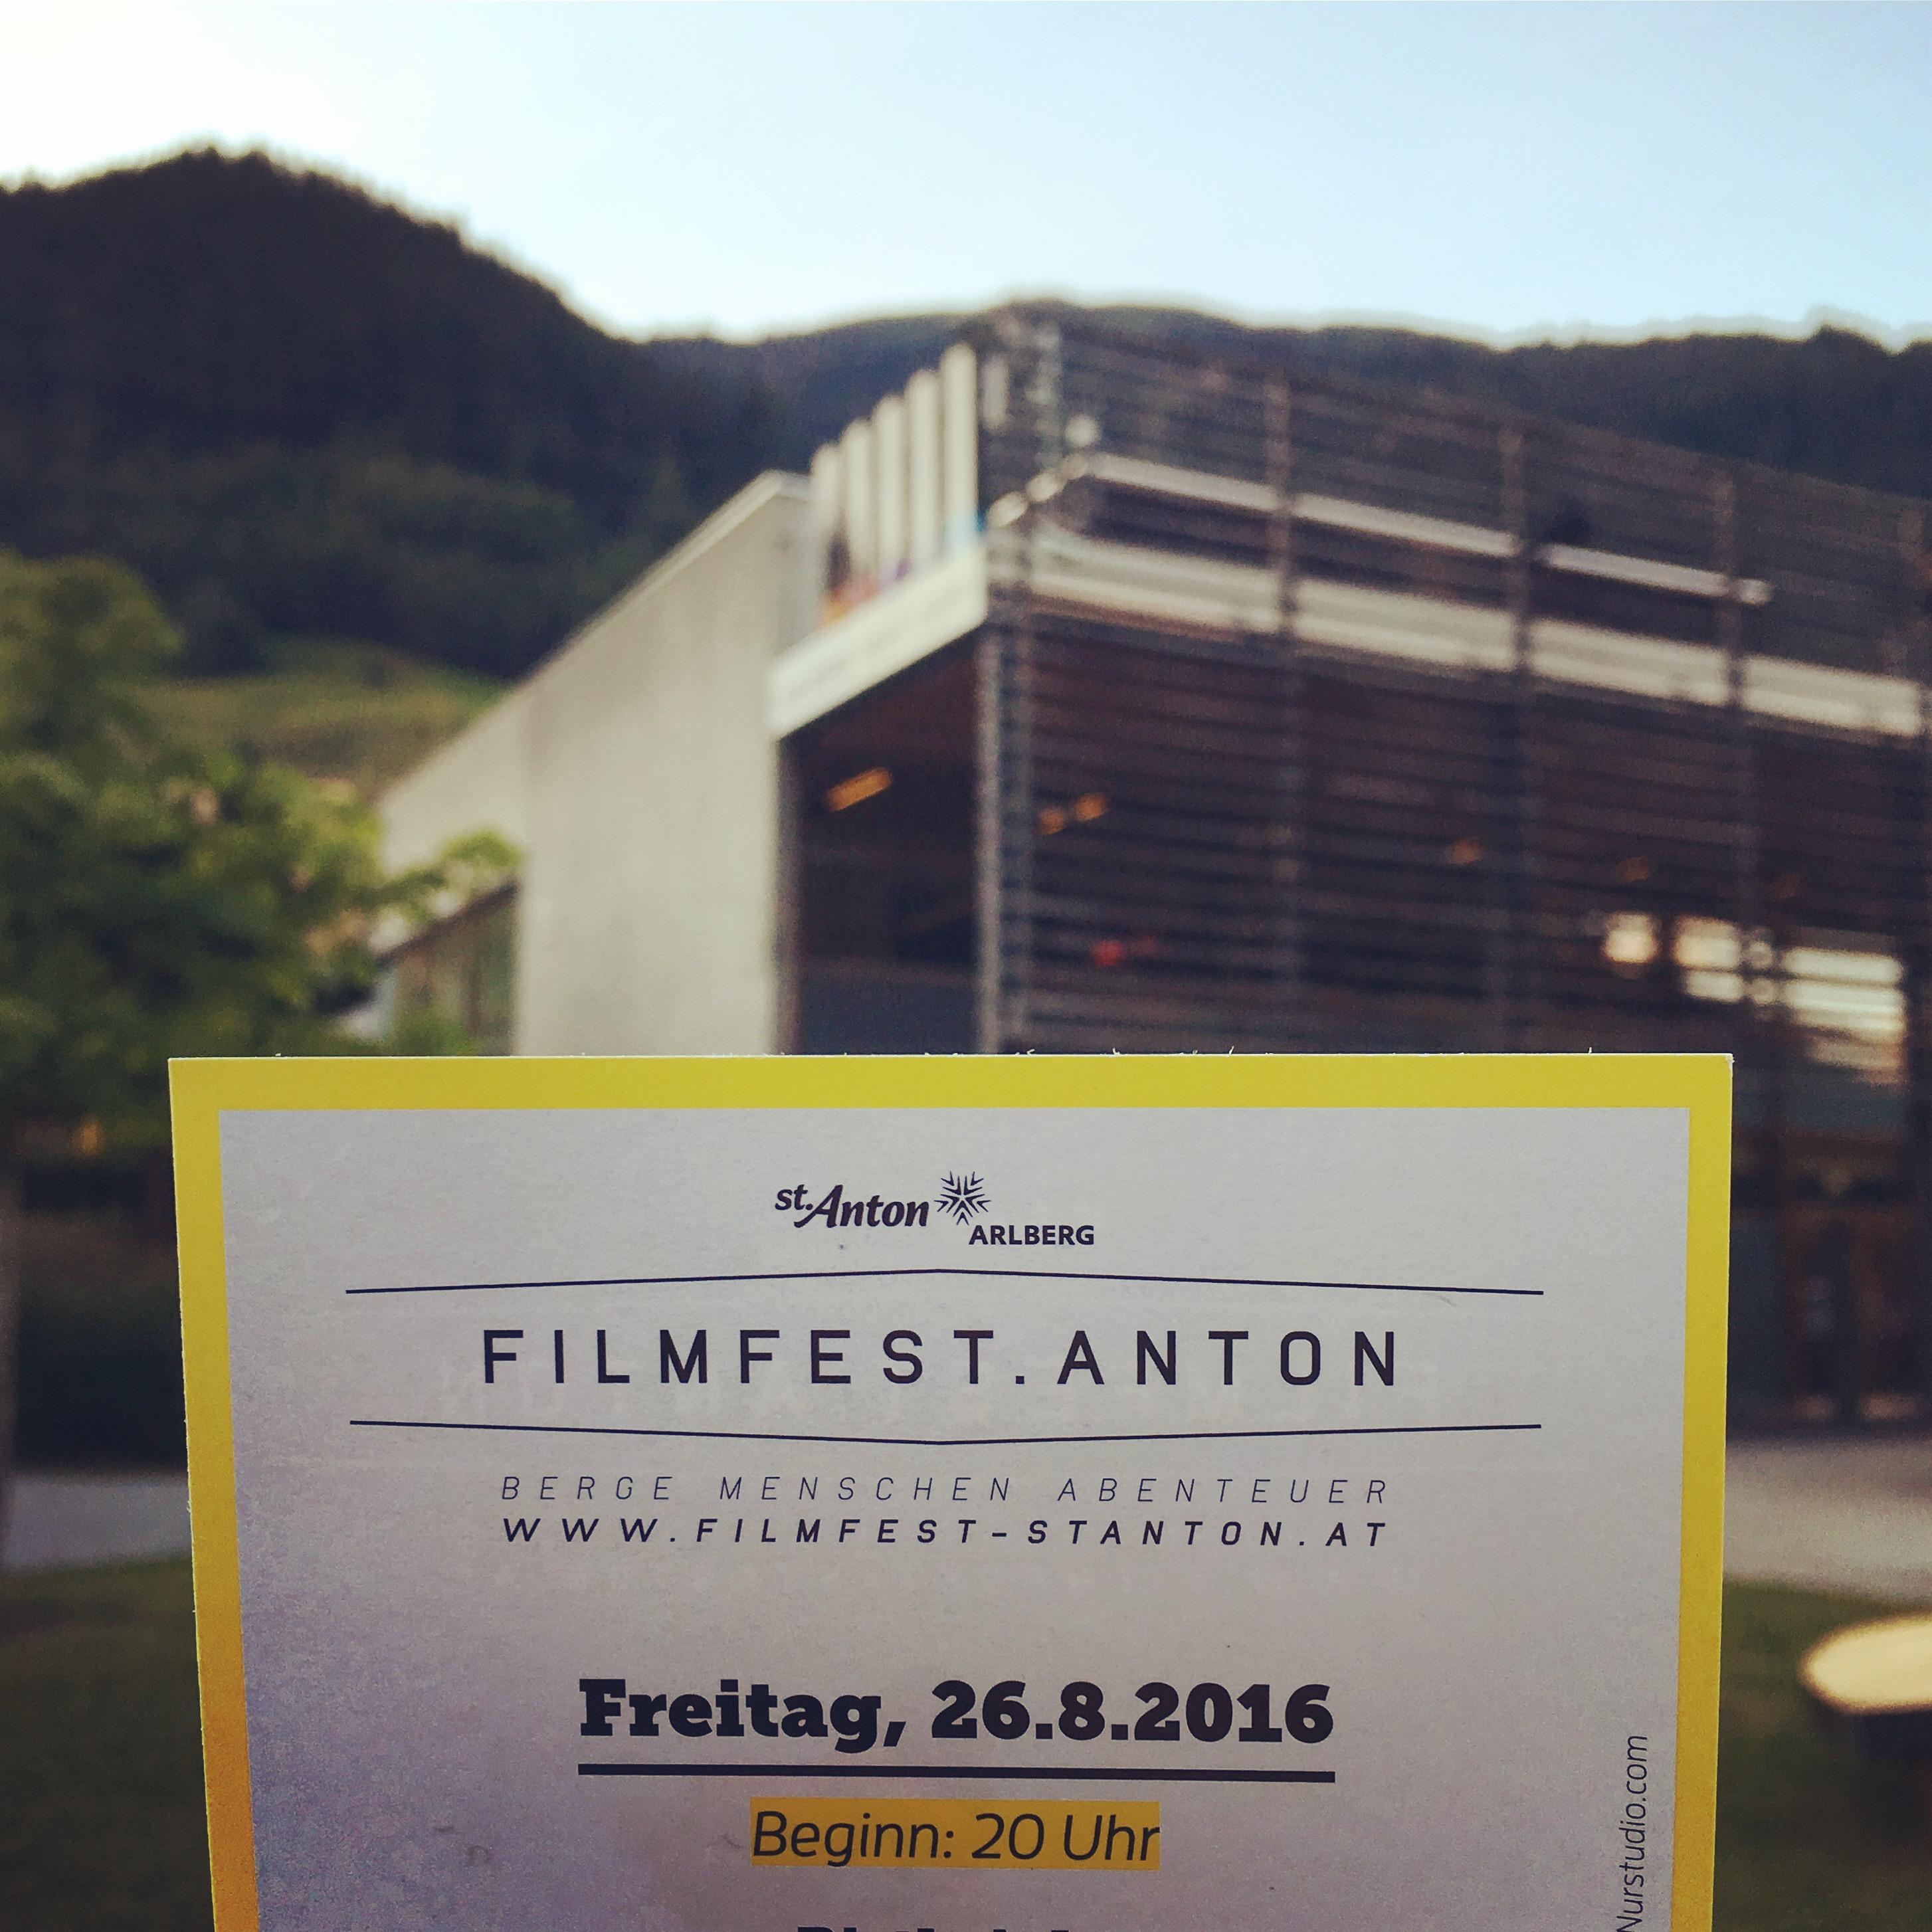 1maybeyoulike_filmfest_stanton